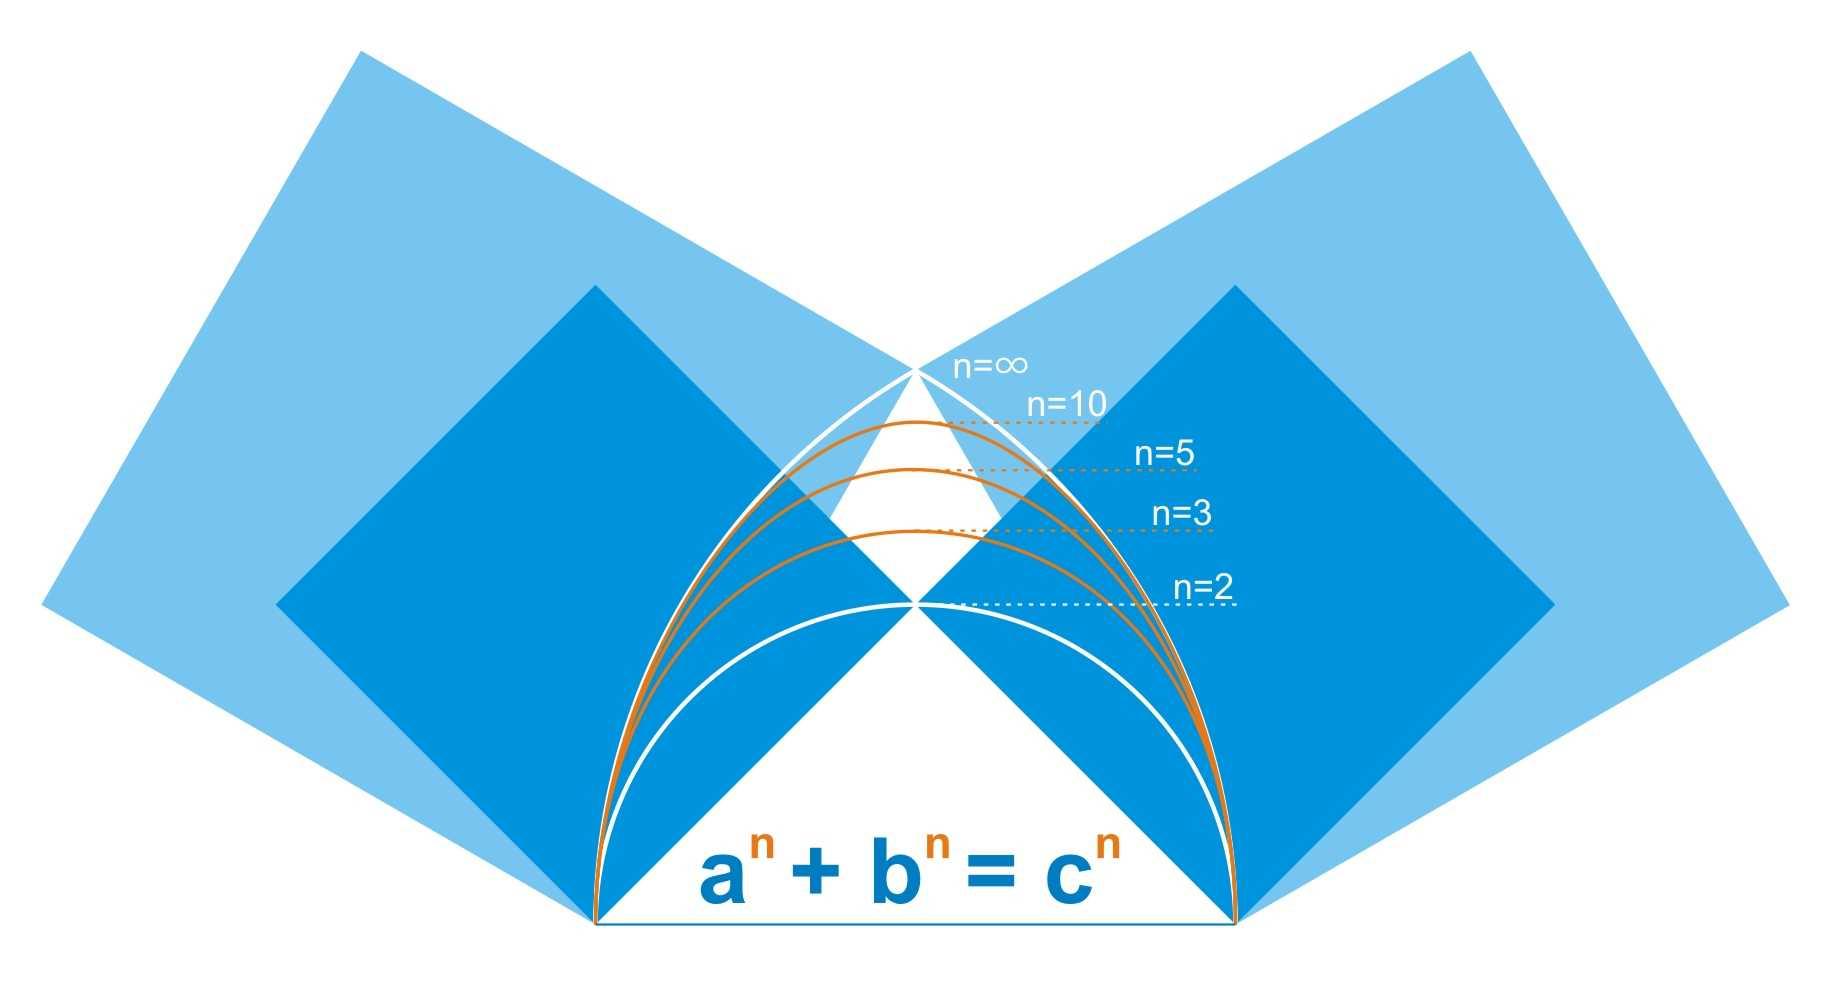 http://forum.matematika.cz/upload3/img/2018-08/64869_pythn.jpg